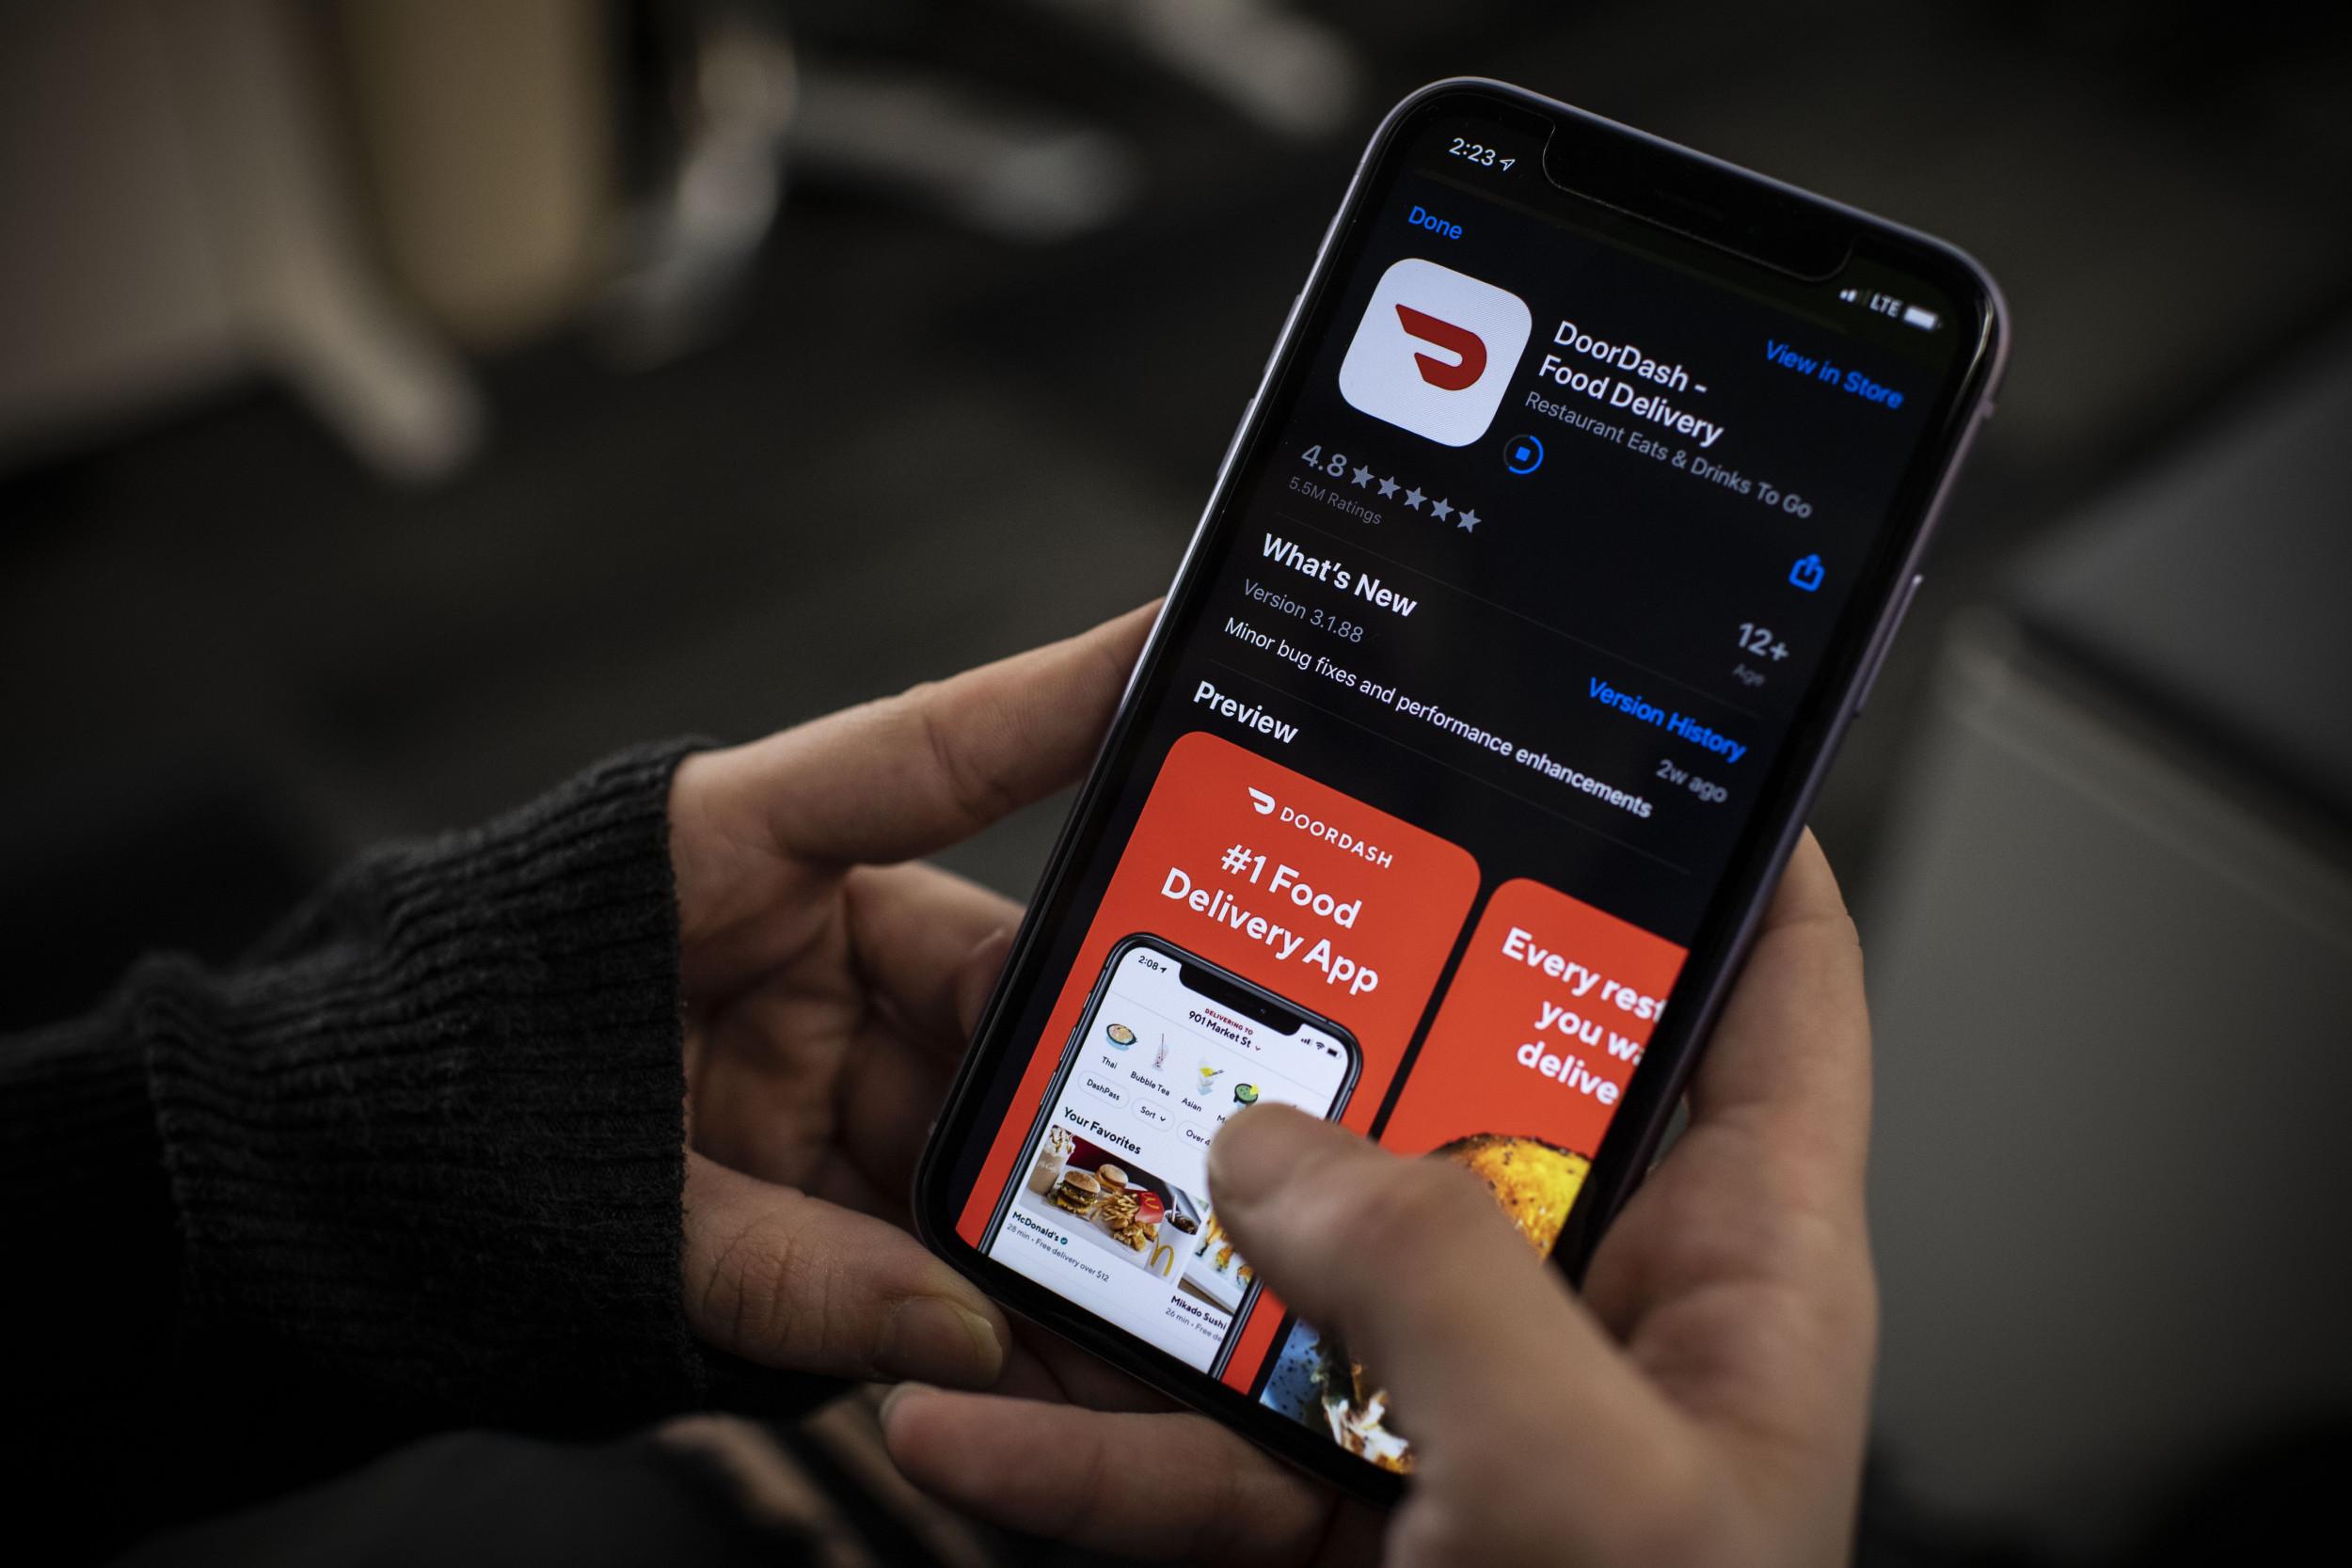 Weight loss DoorDash Driver Gives Customer Weight Loss Business Card in McDonald's Order thumbnail